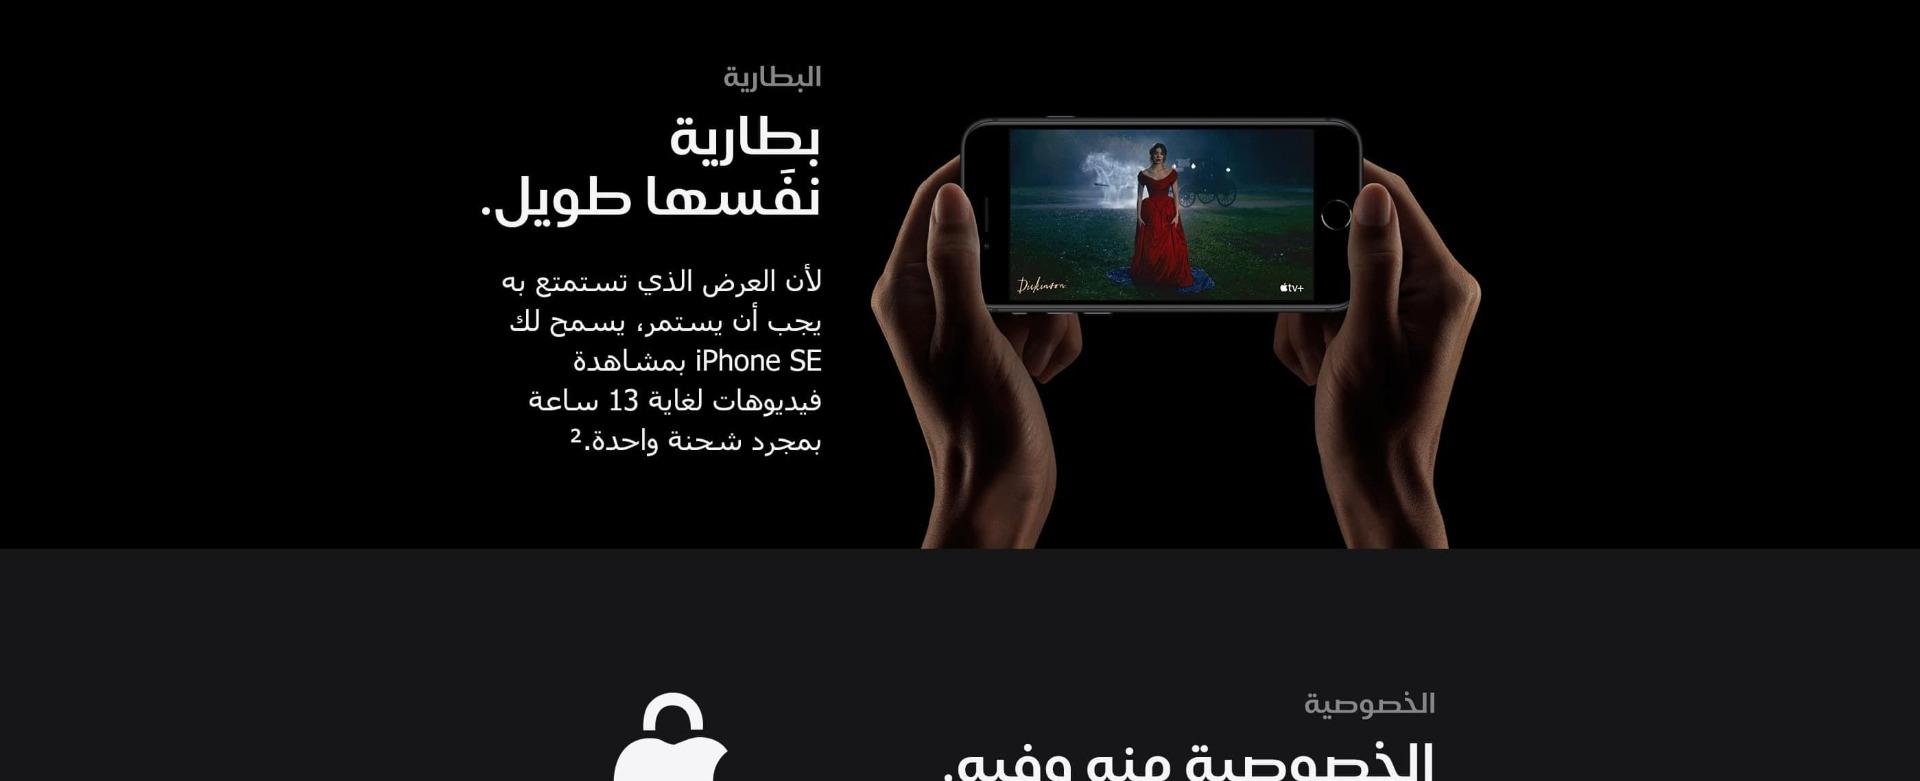 "Buy New iPhone SE""></p> <p style="